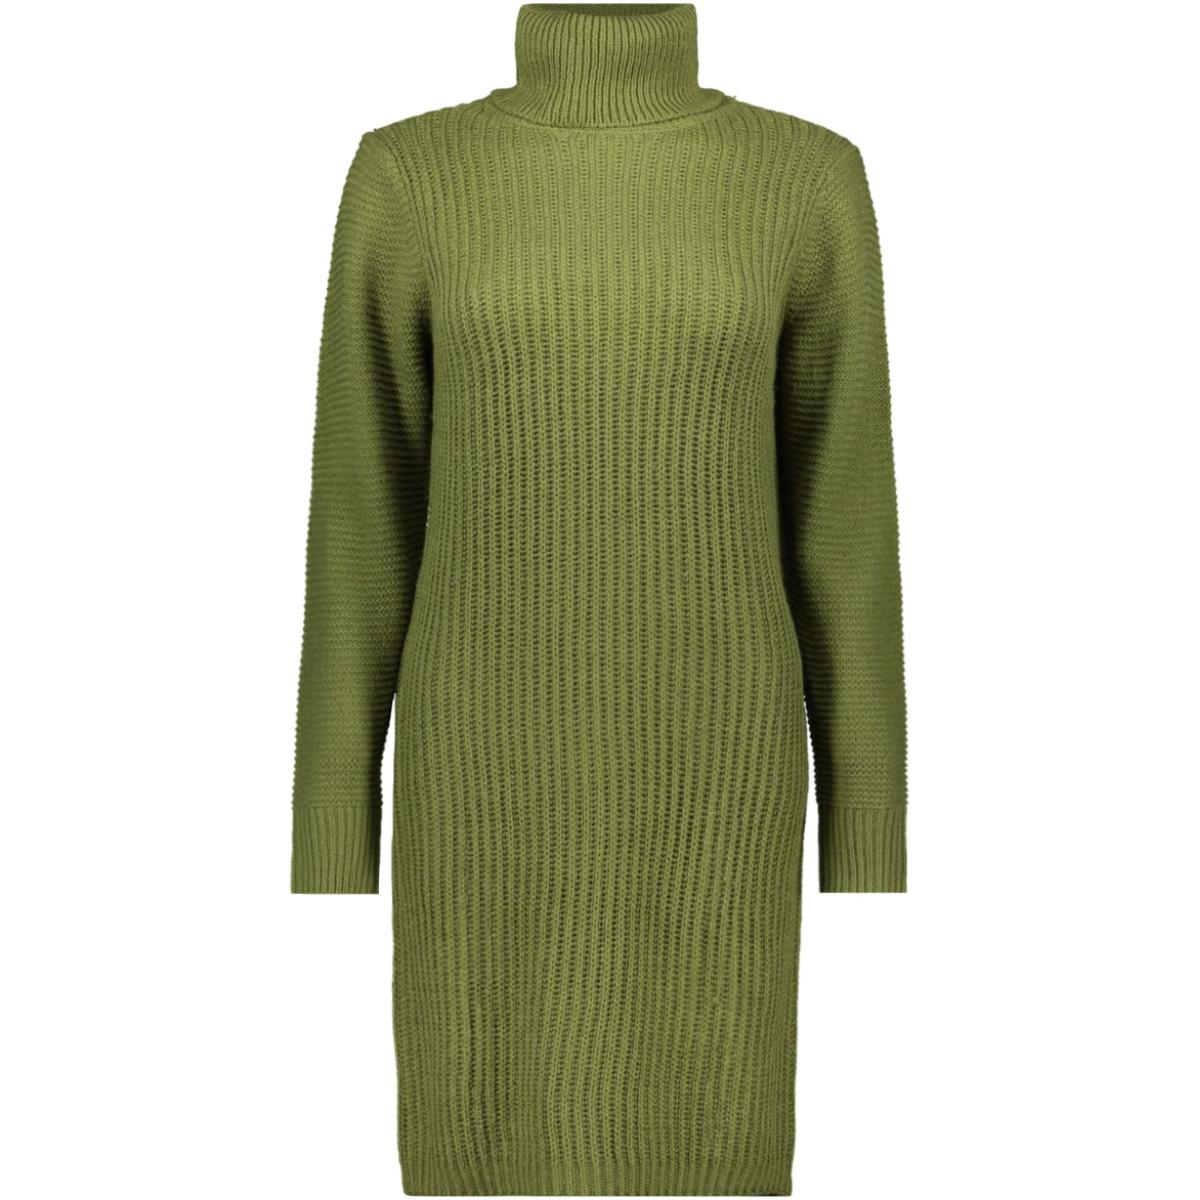 nmaiden l/s high neck knit dress 27009459 noisy may jurk olivine